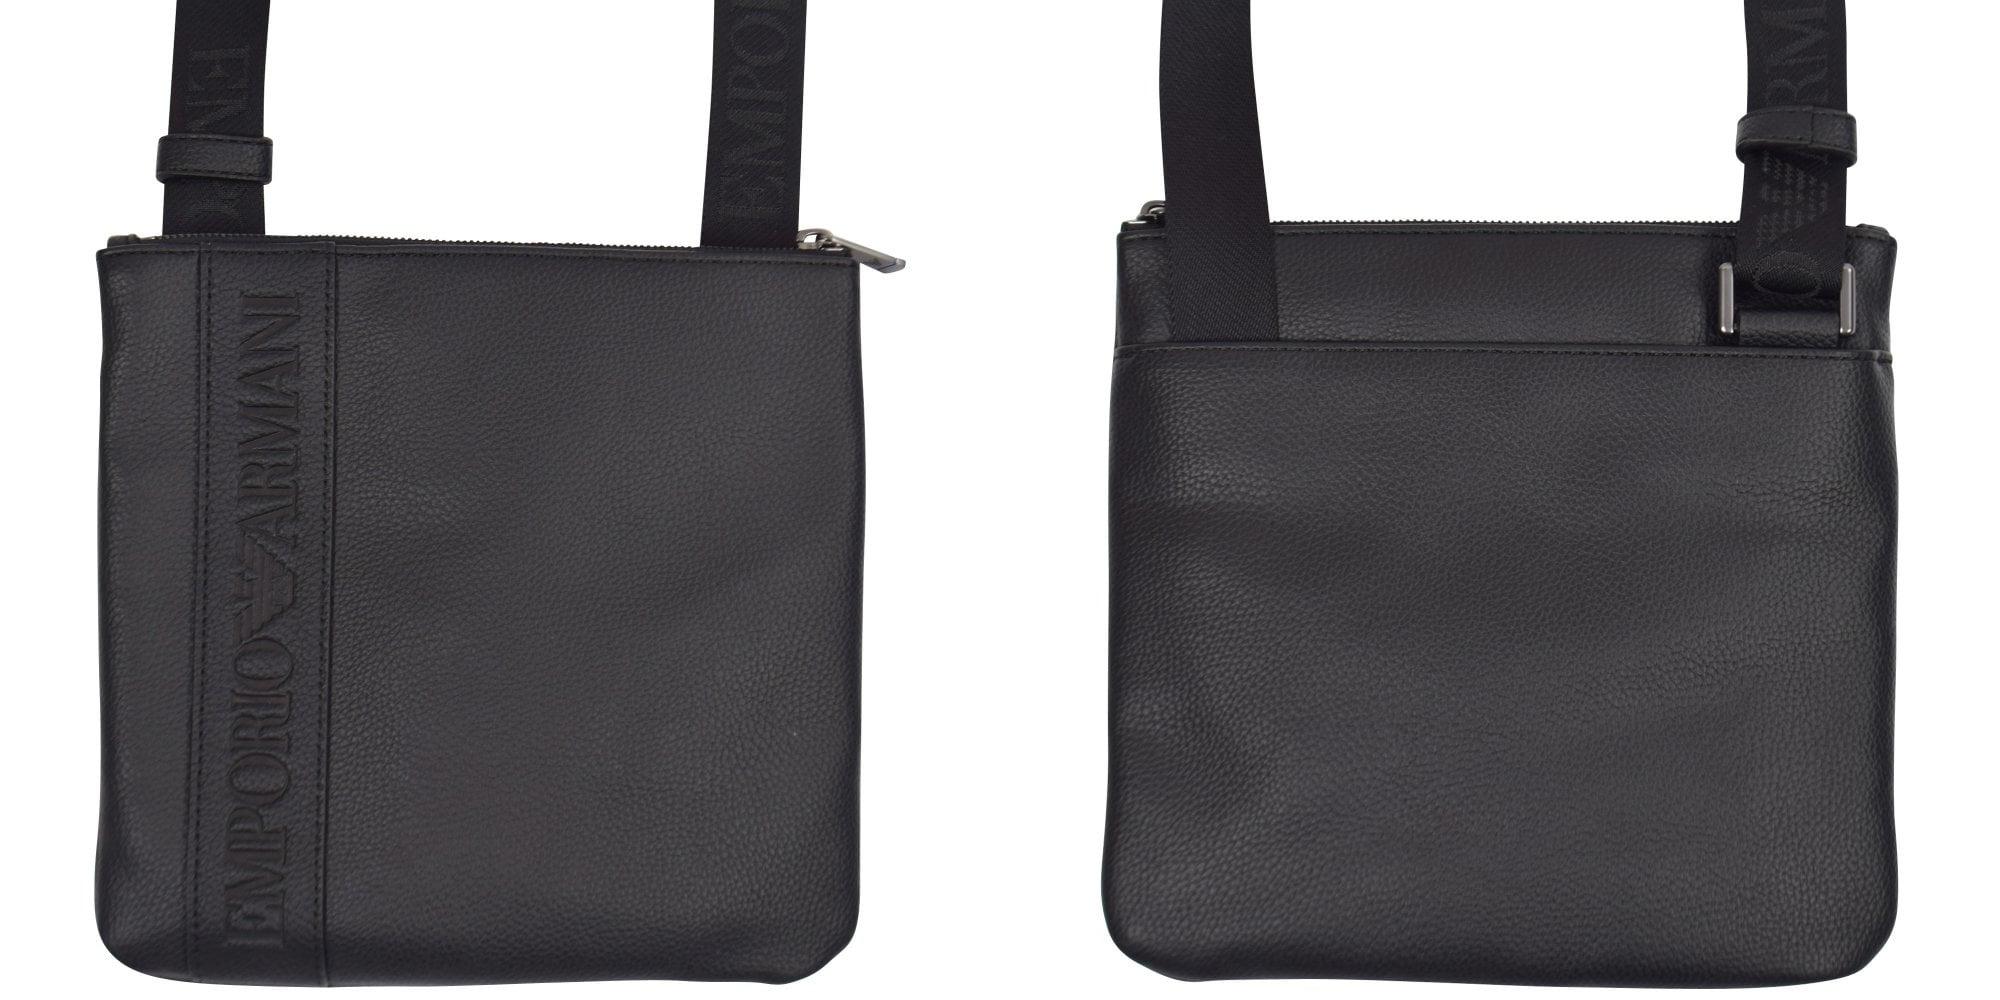 Image of Emporio Armani Bag